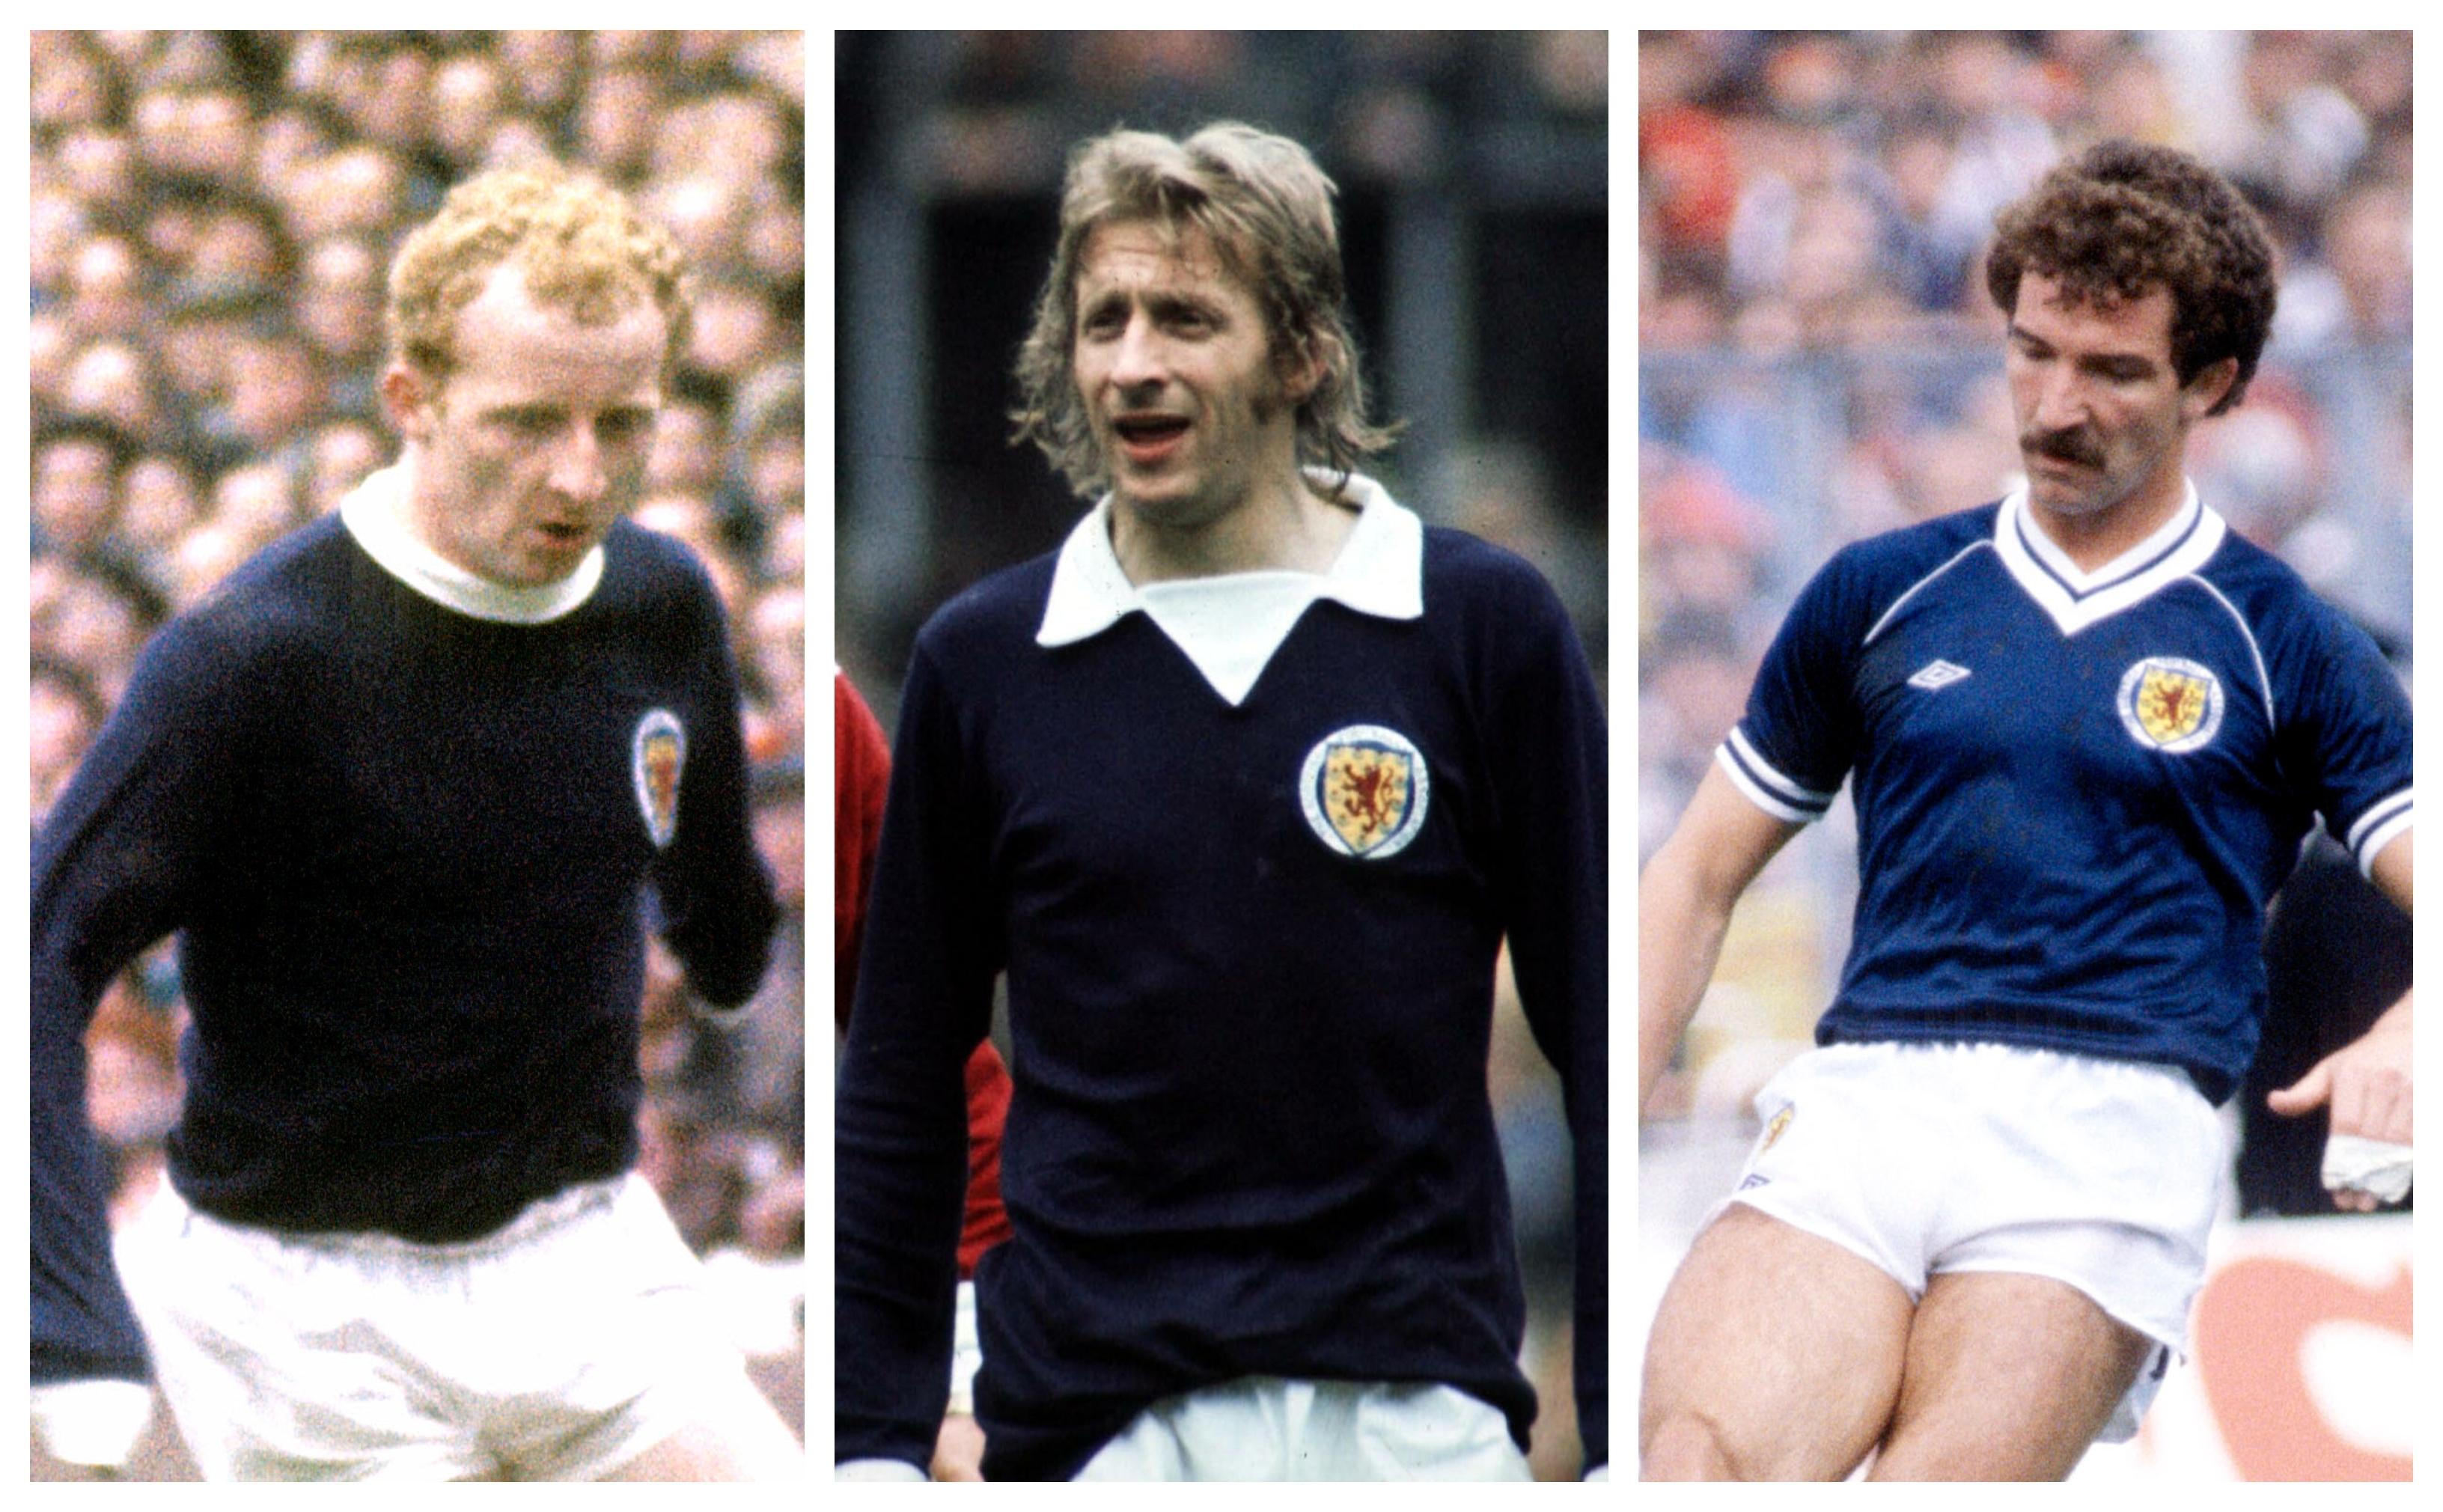 Scotland legends Jimmy Johnstone, Denis Law and Graeme Souness